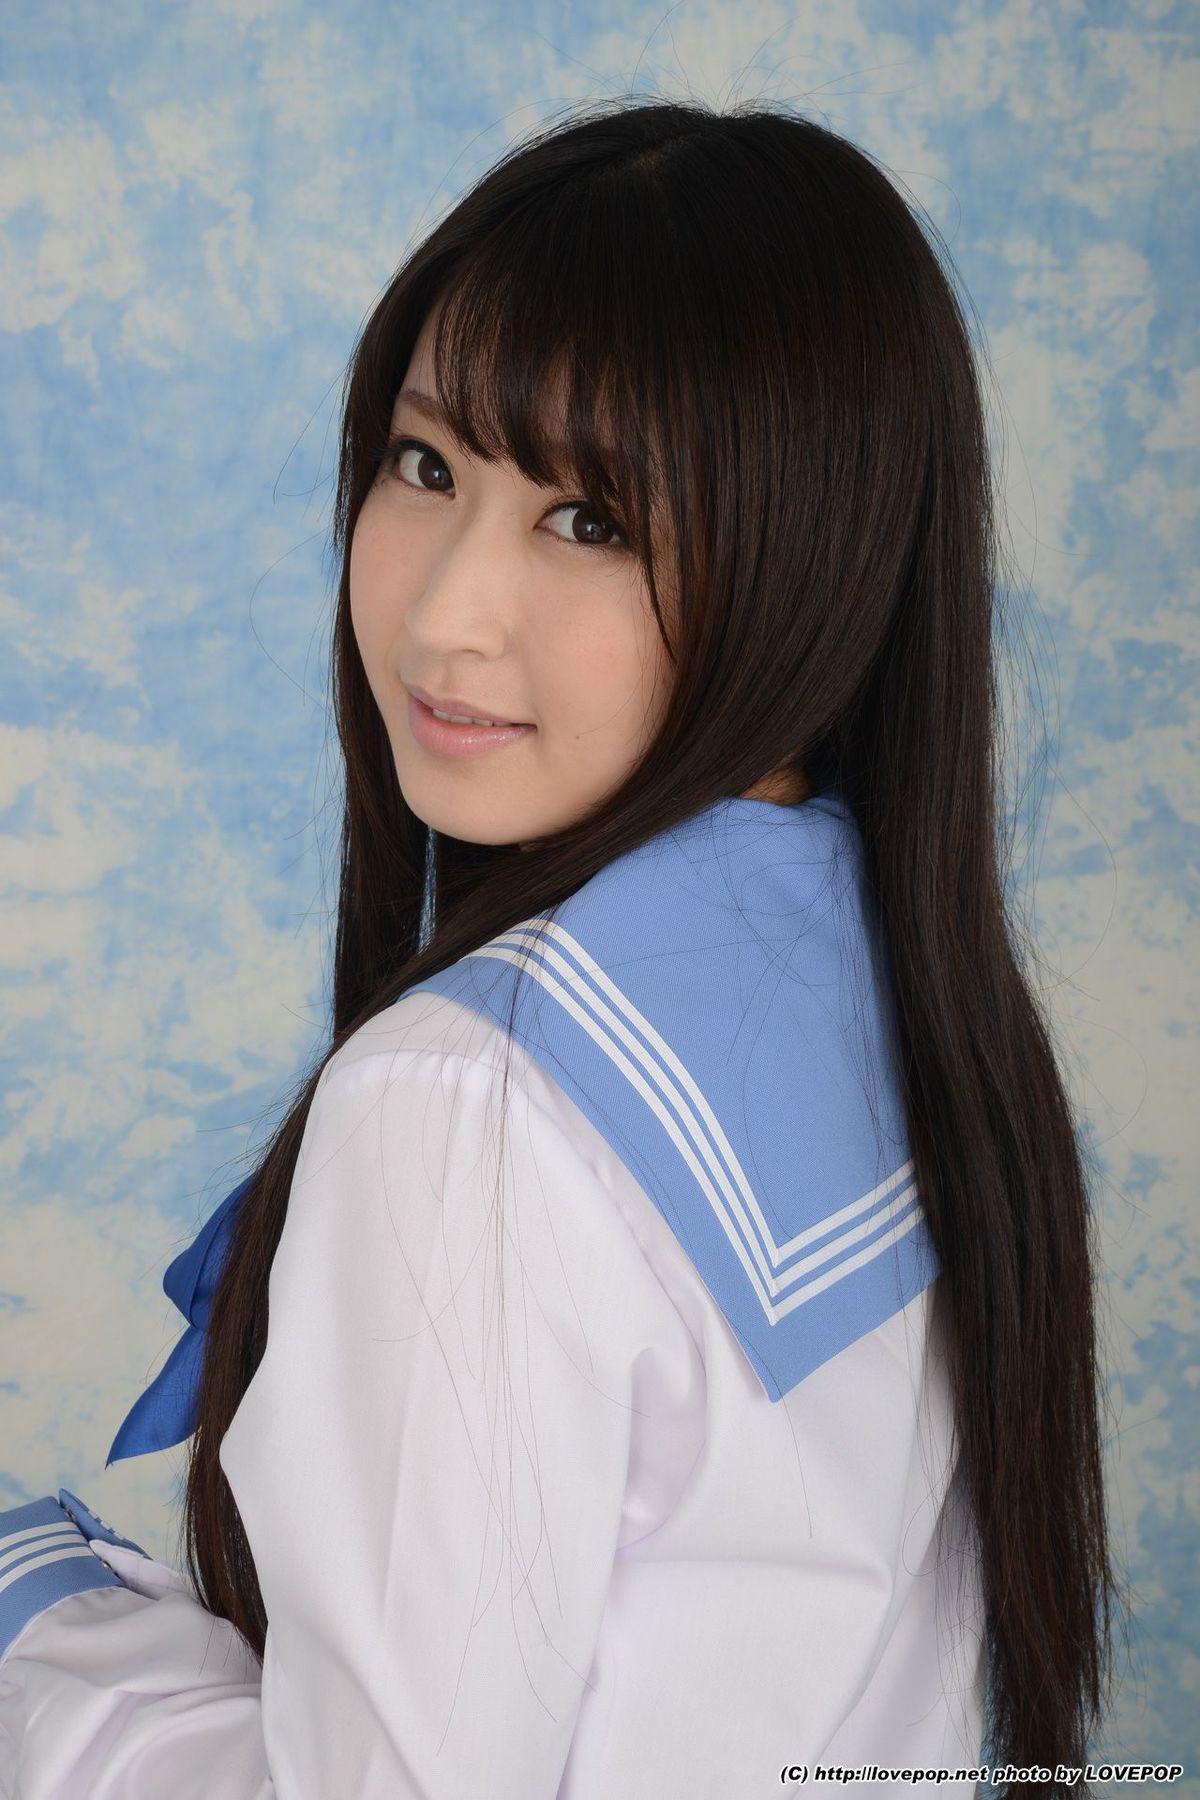 Arisa Misato - Người tình ngọt ngào 18+ | anhhot69